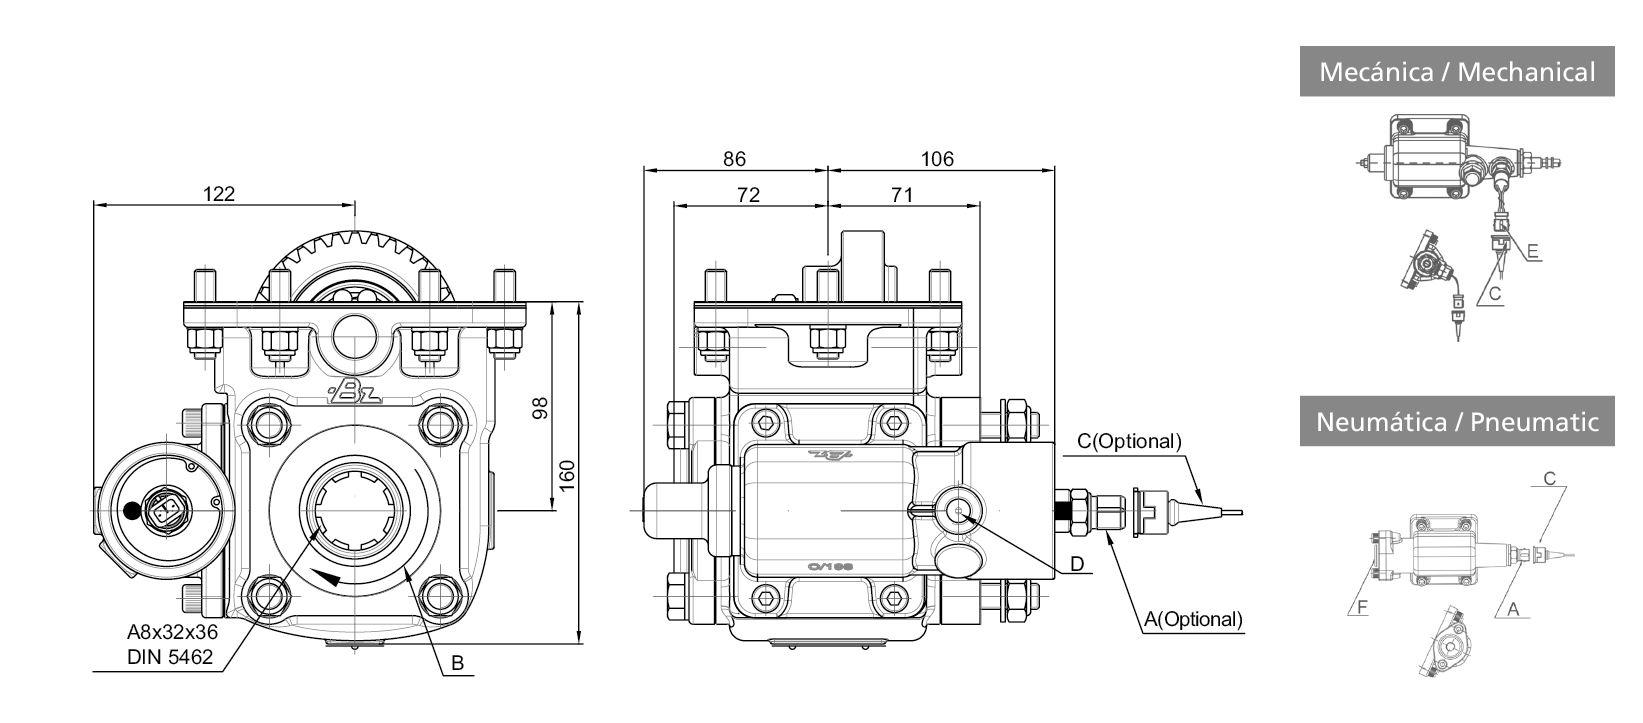 270503 side mount vacuum- single acting